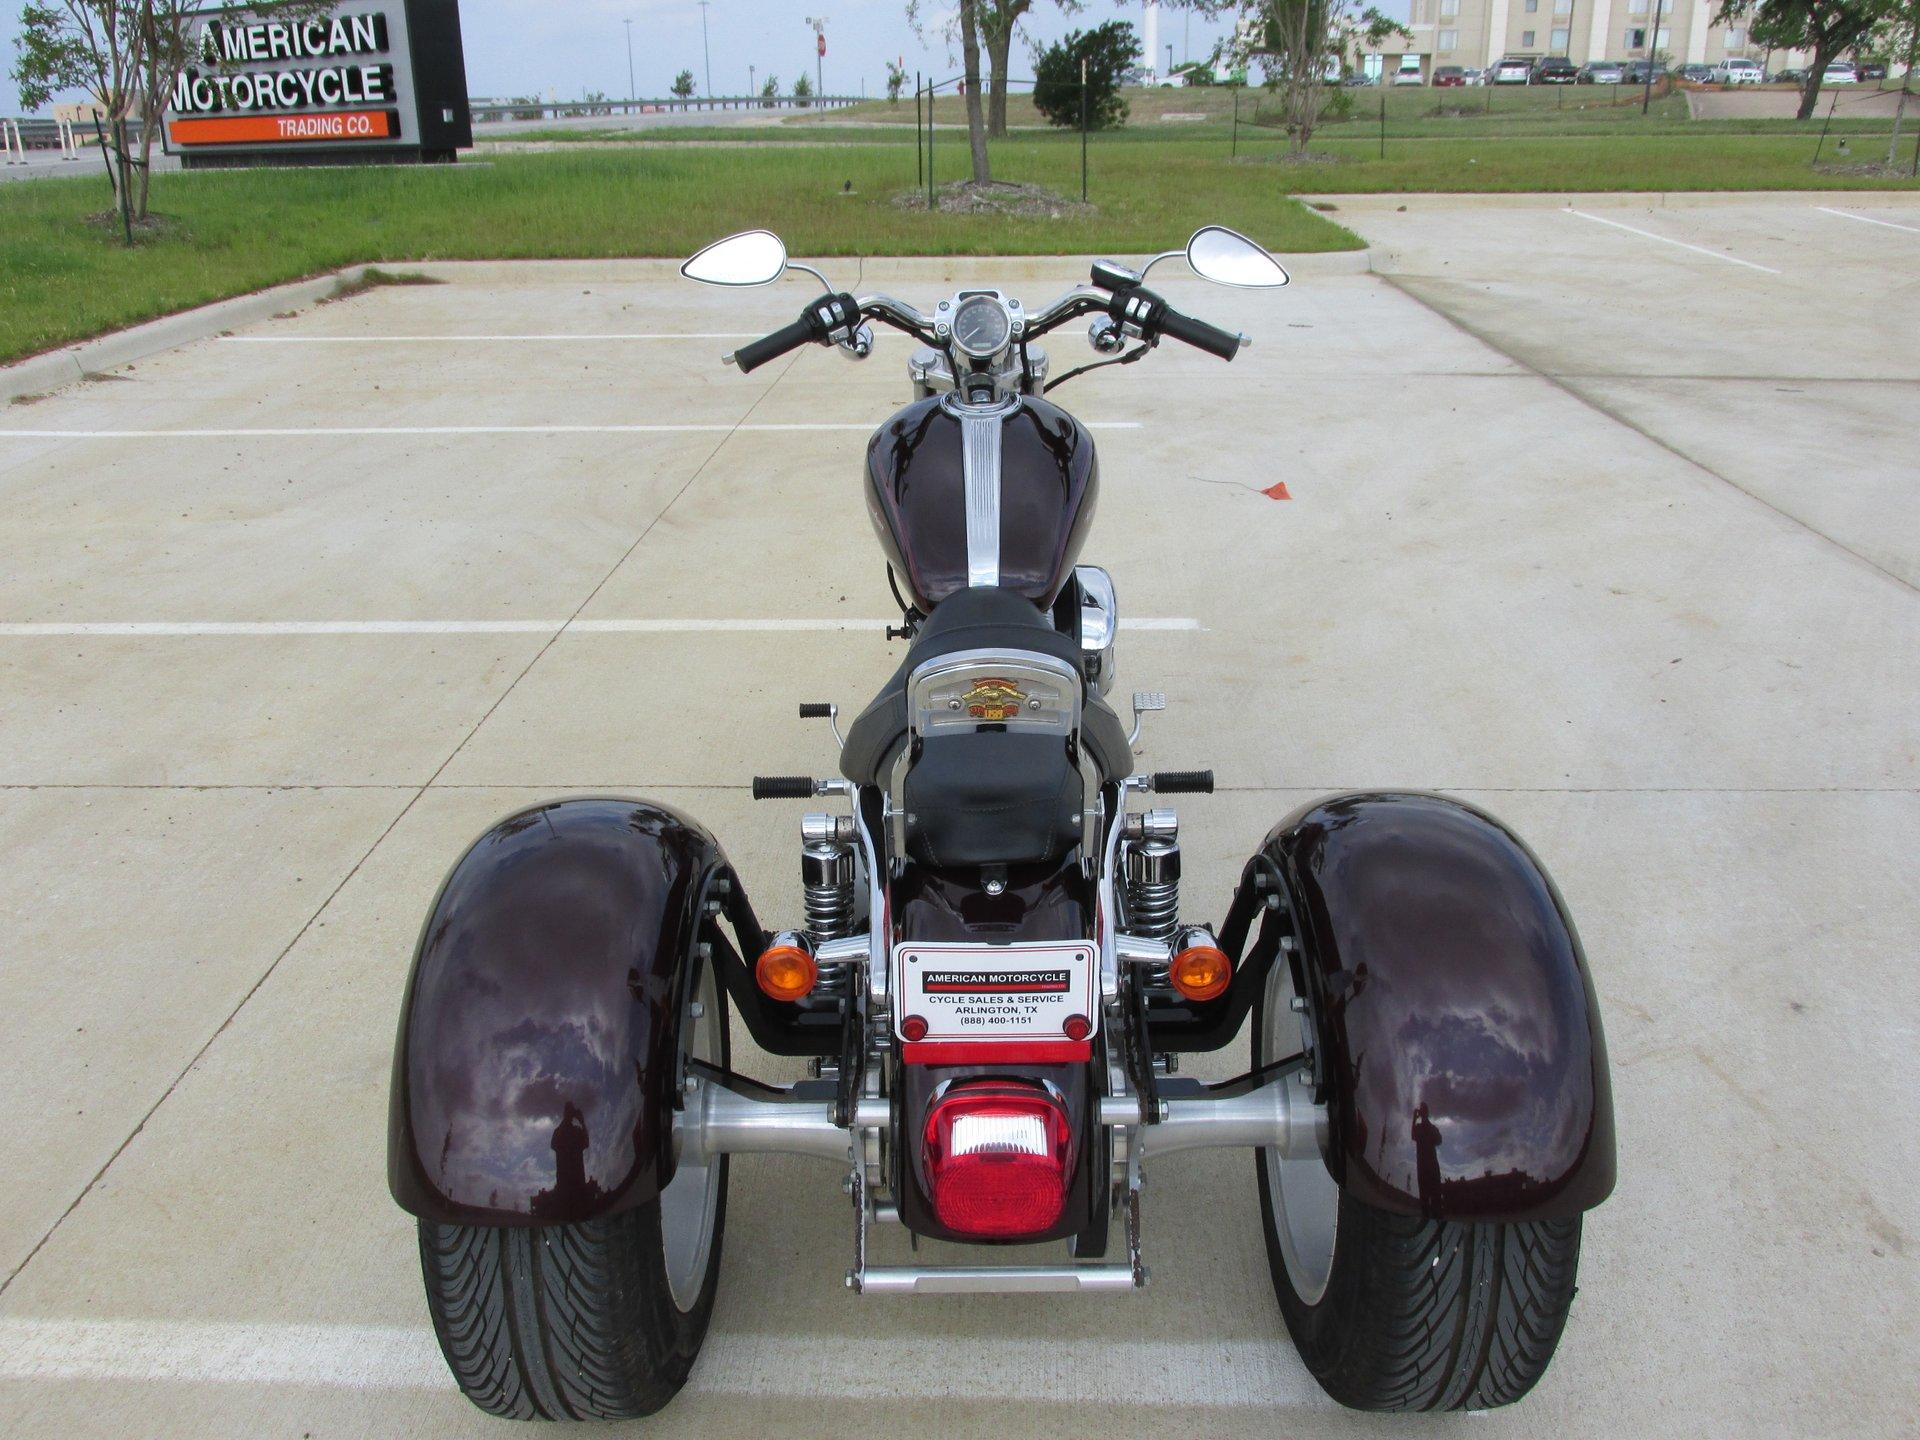 2005 Harley-Davidson Sportster 883 XL883C 883 CUSTOM W/TRIKE